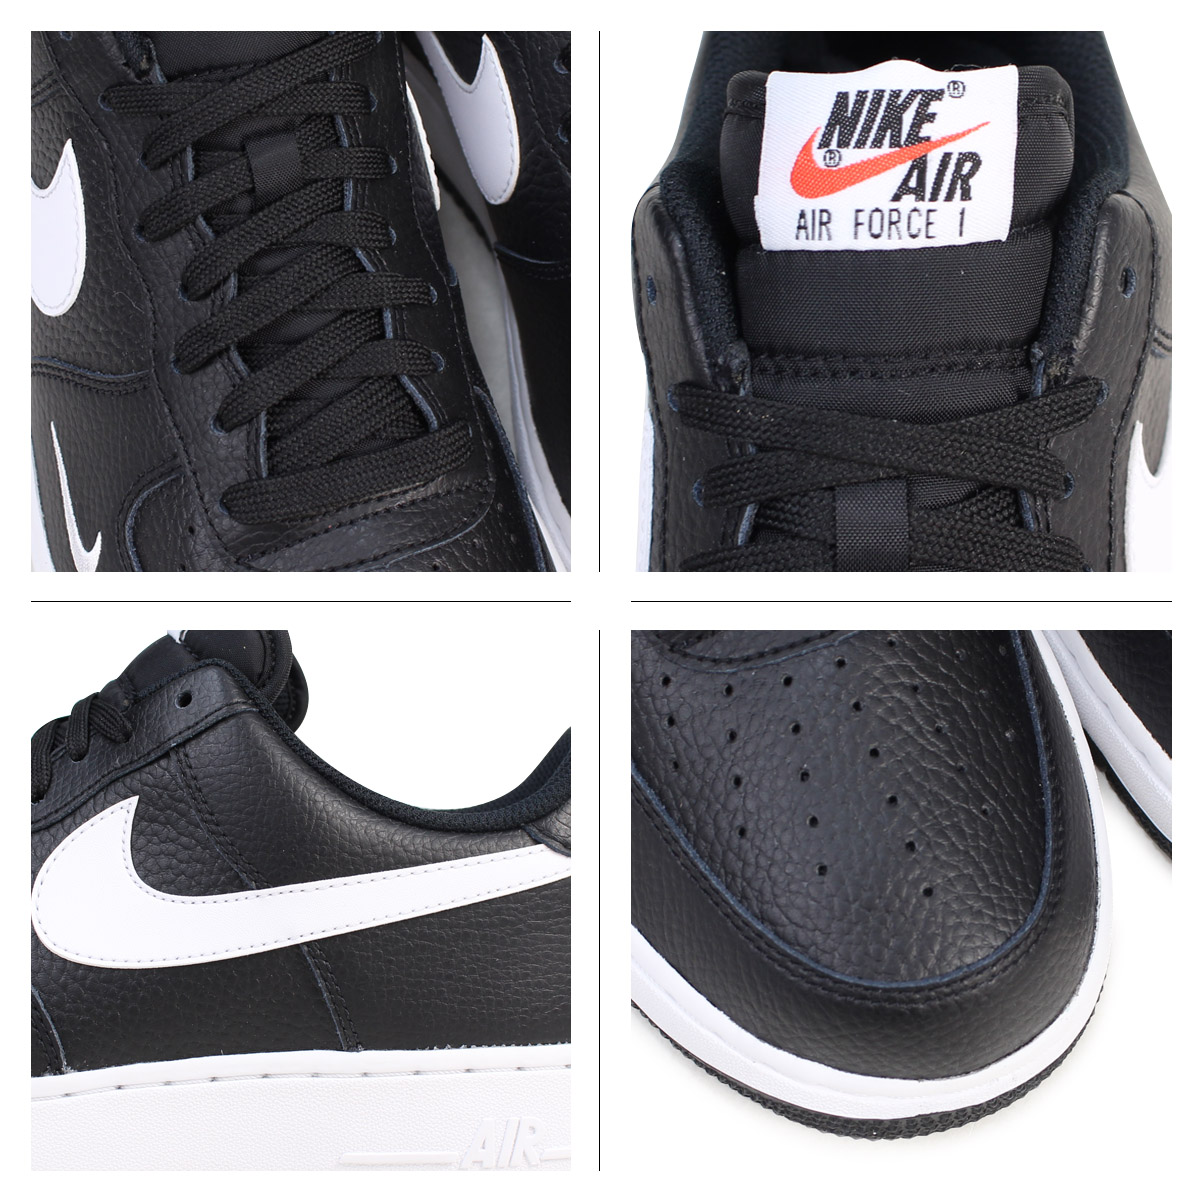 NIKE Nike air force 1 sneakers AIR FORCE 1 LOW 07 low 820,266 021 men's shoes black black